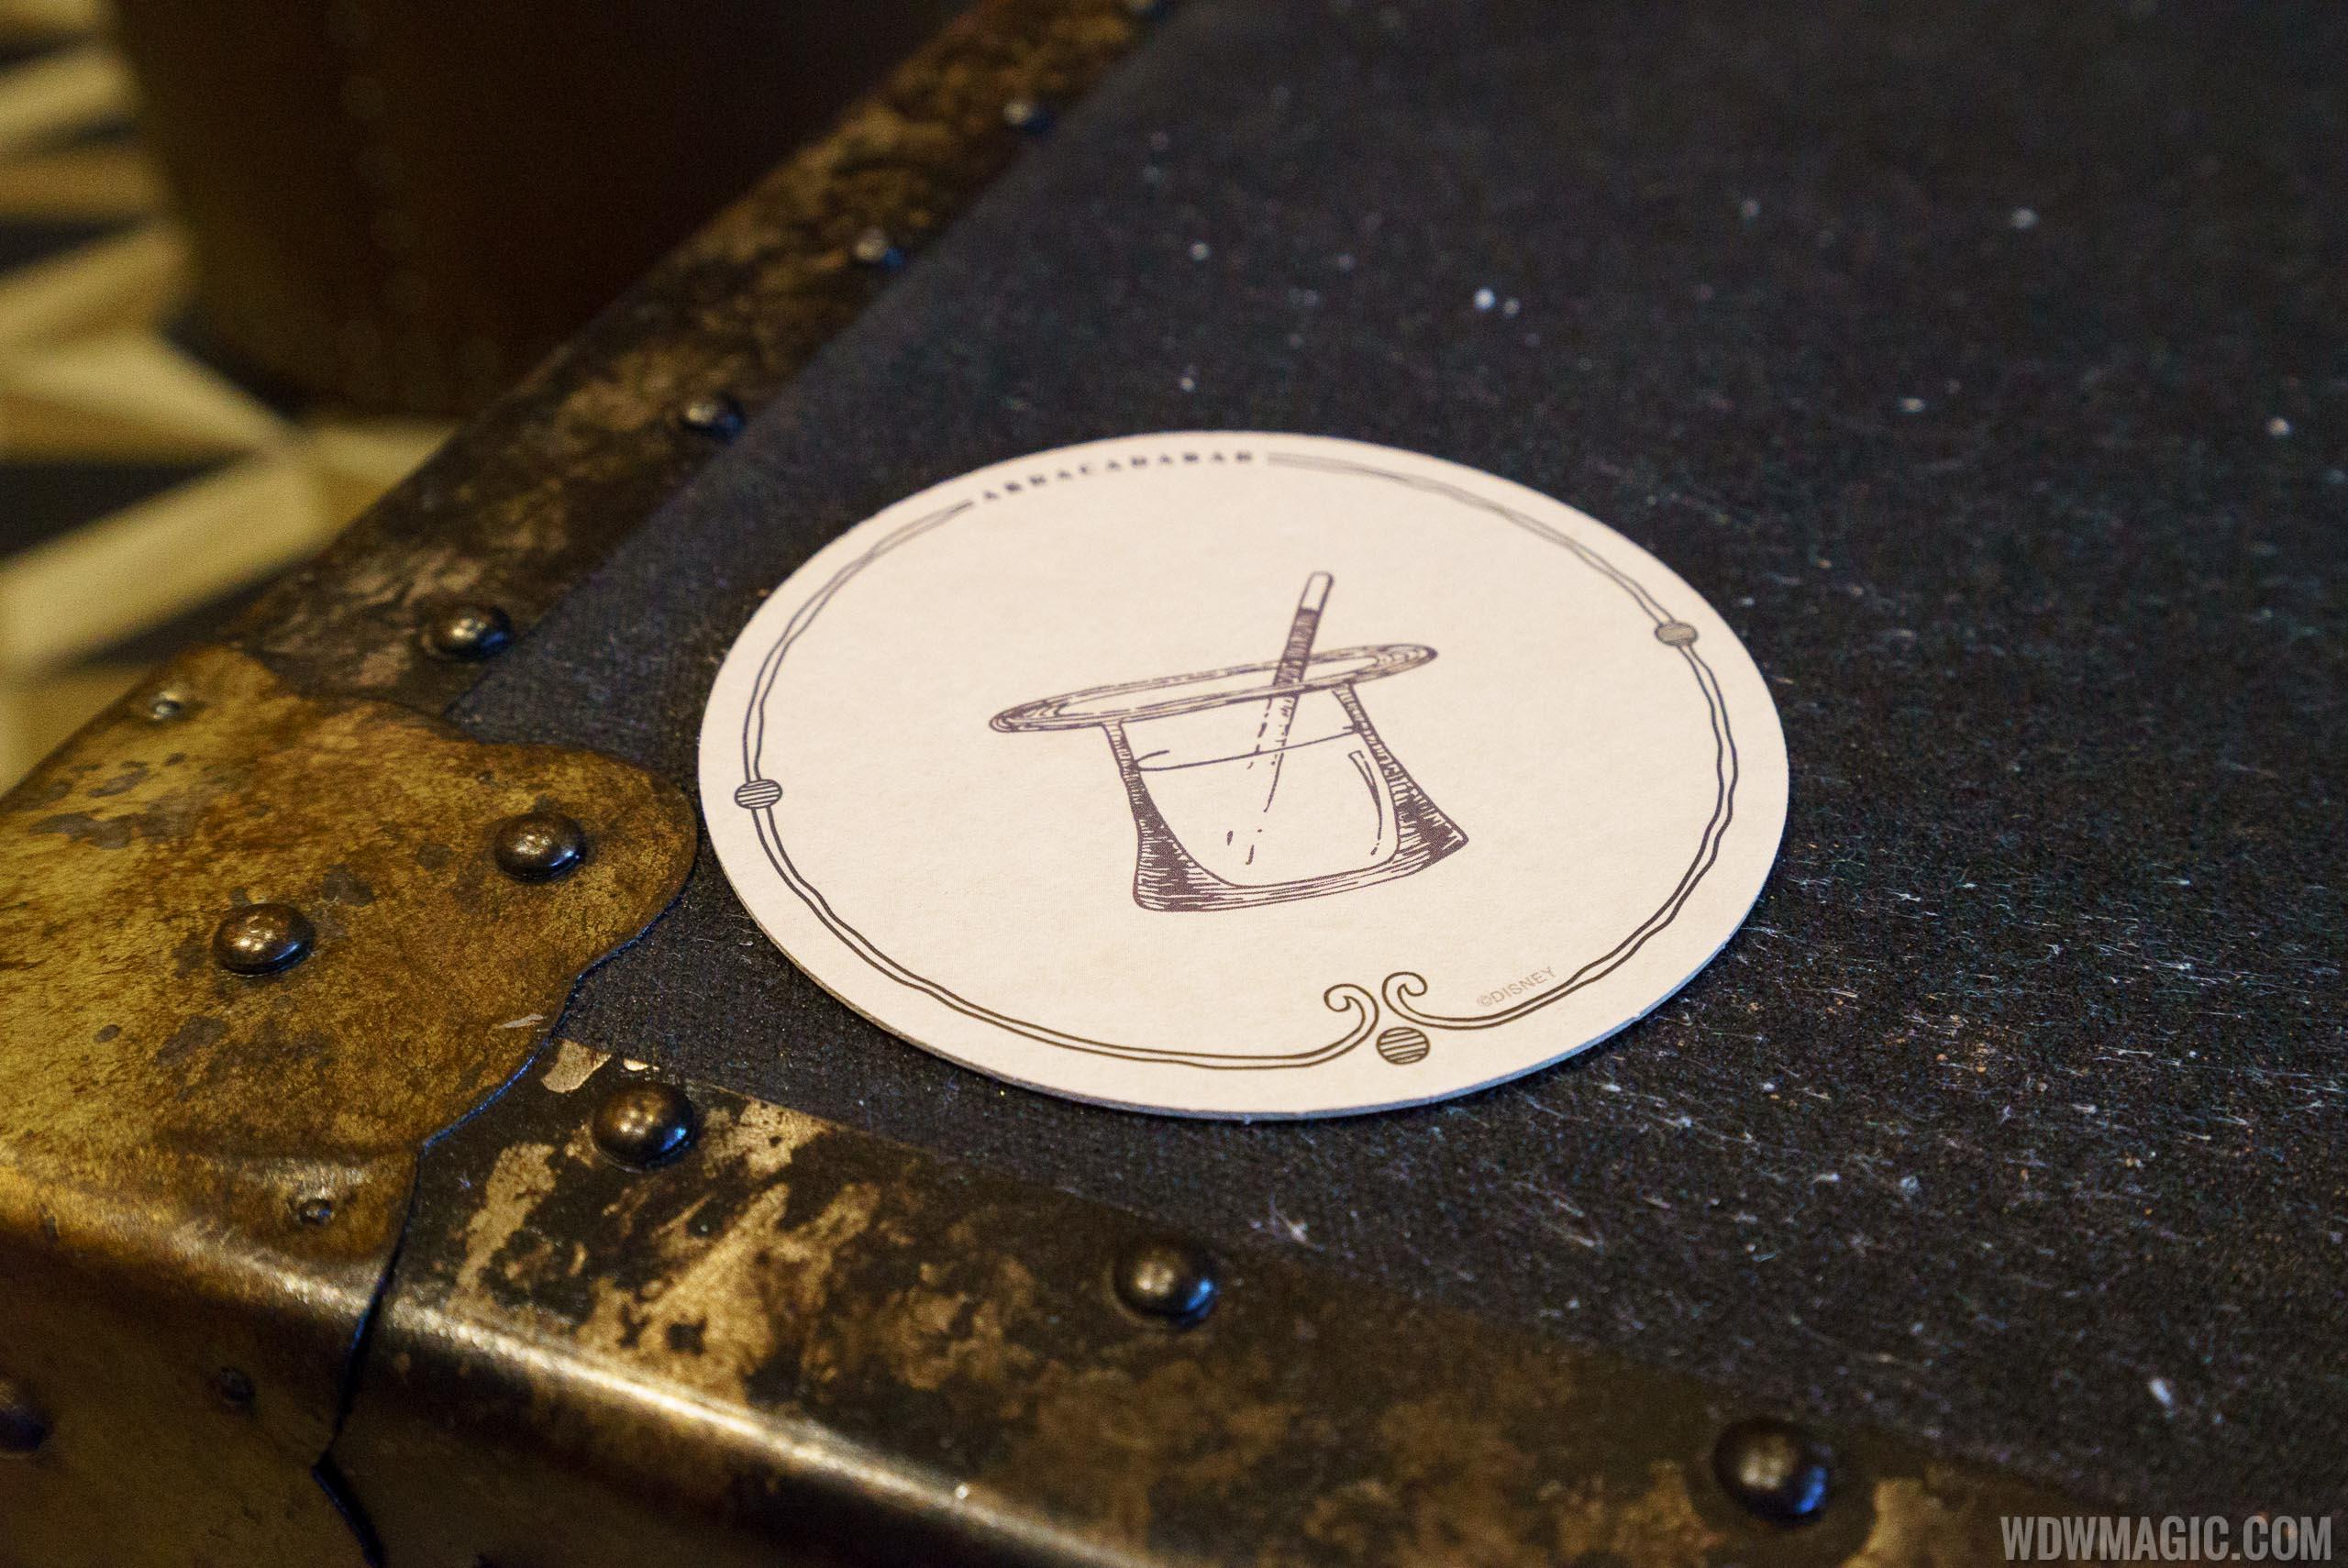 AbracadaBAR coaster